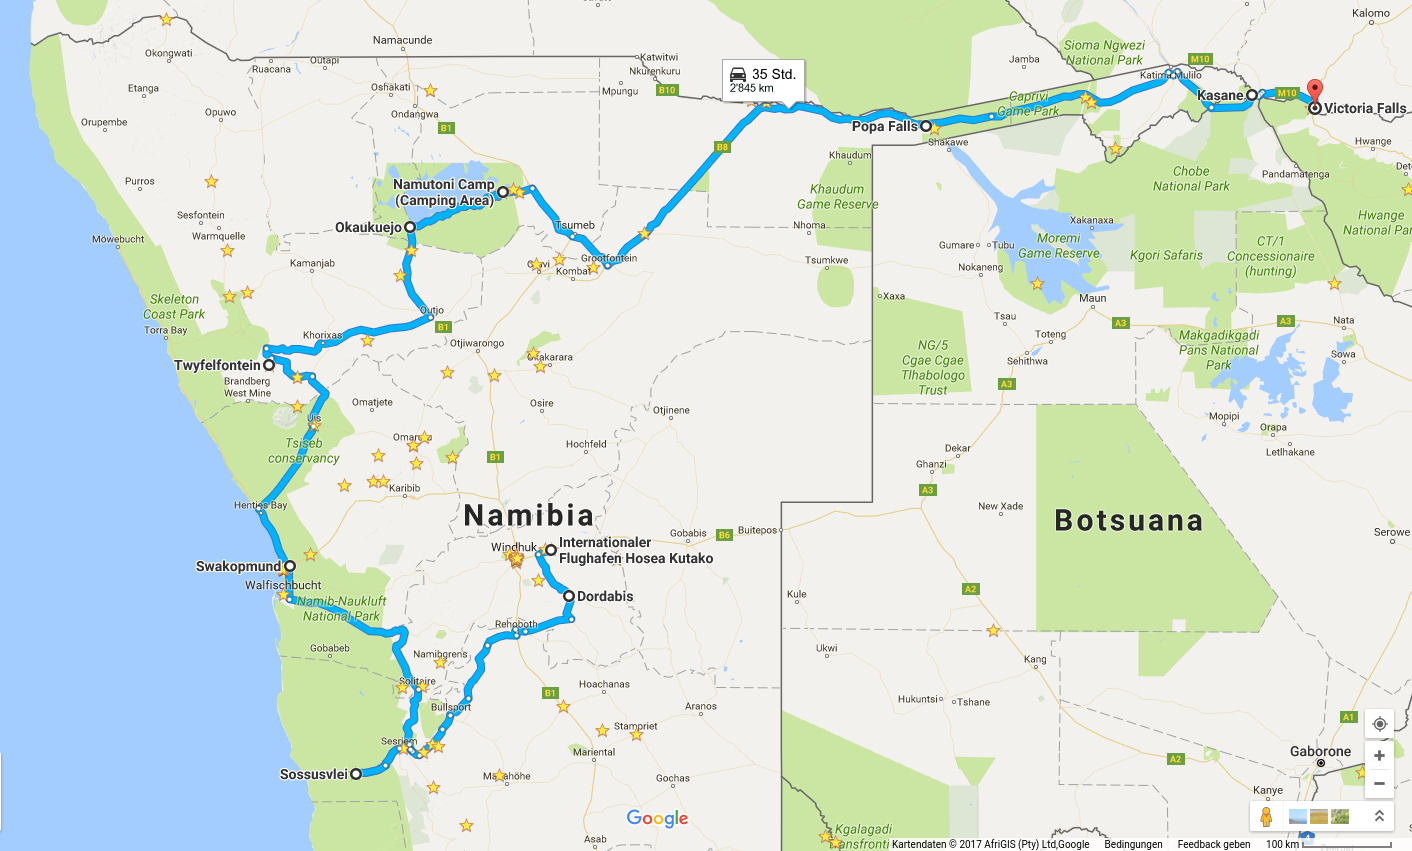 Kartenausschnitt Google Maps. Reiseroute Namibias zentrale Highlights, Caprivi, Chobe-Park, Victoria-Fälle